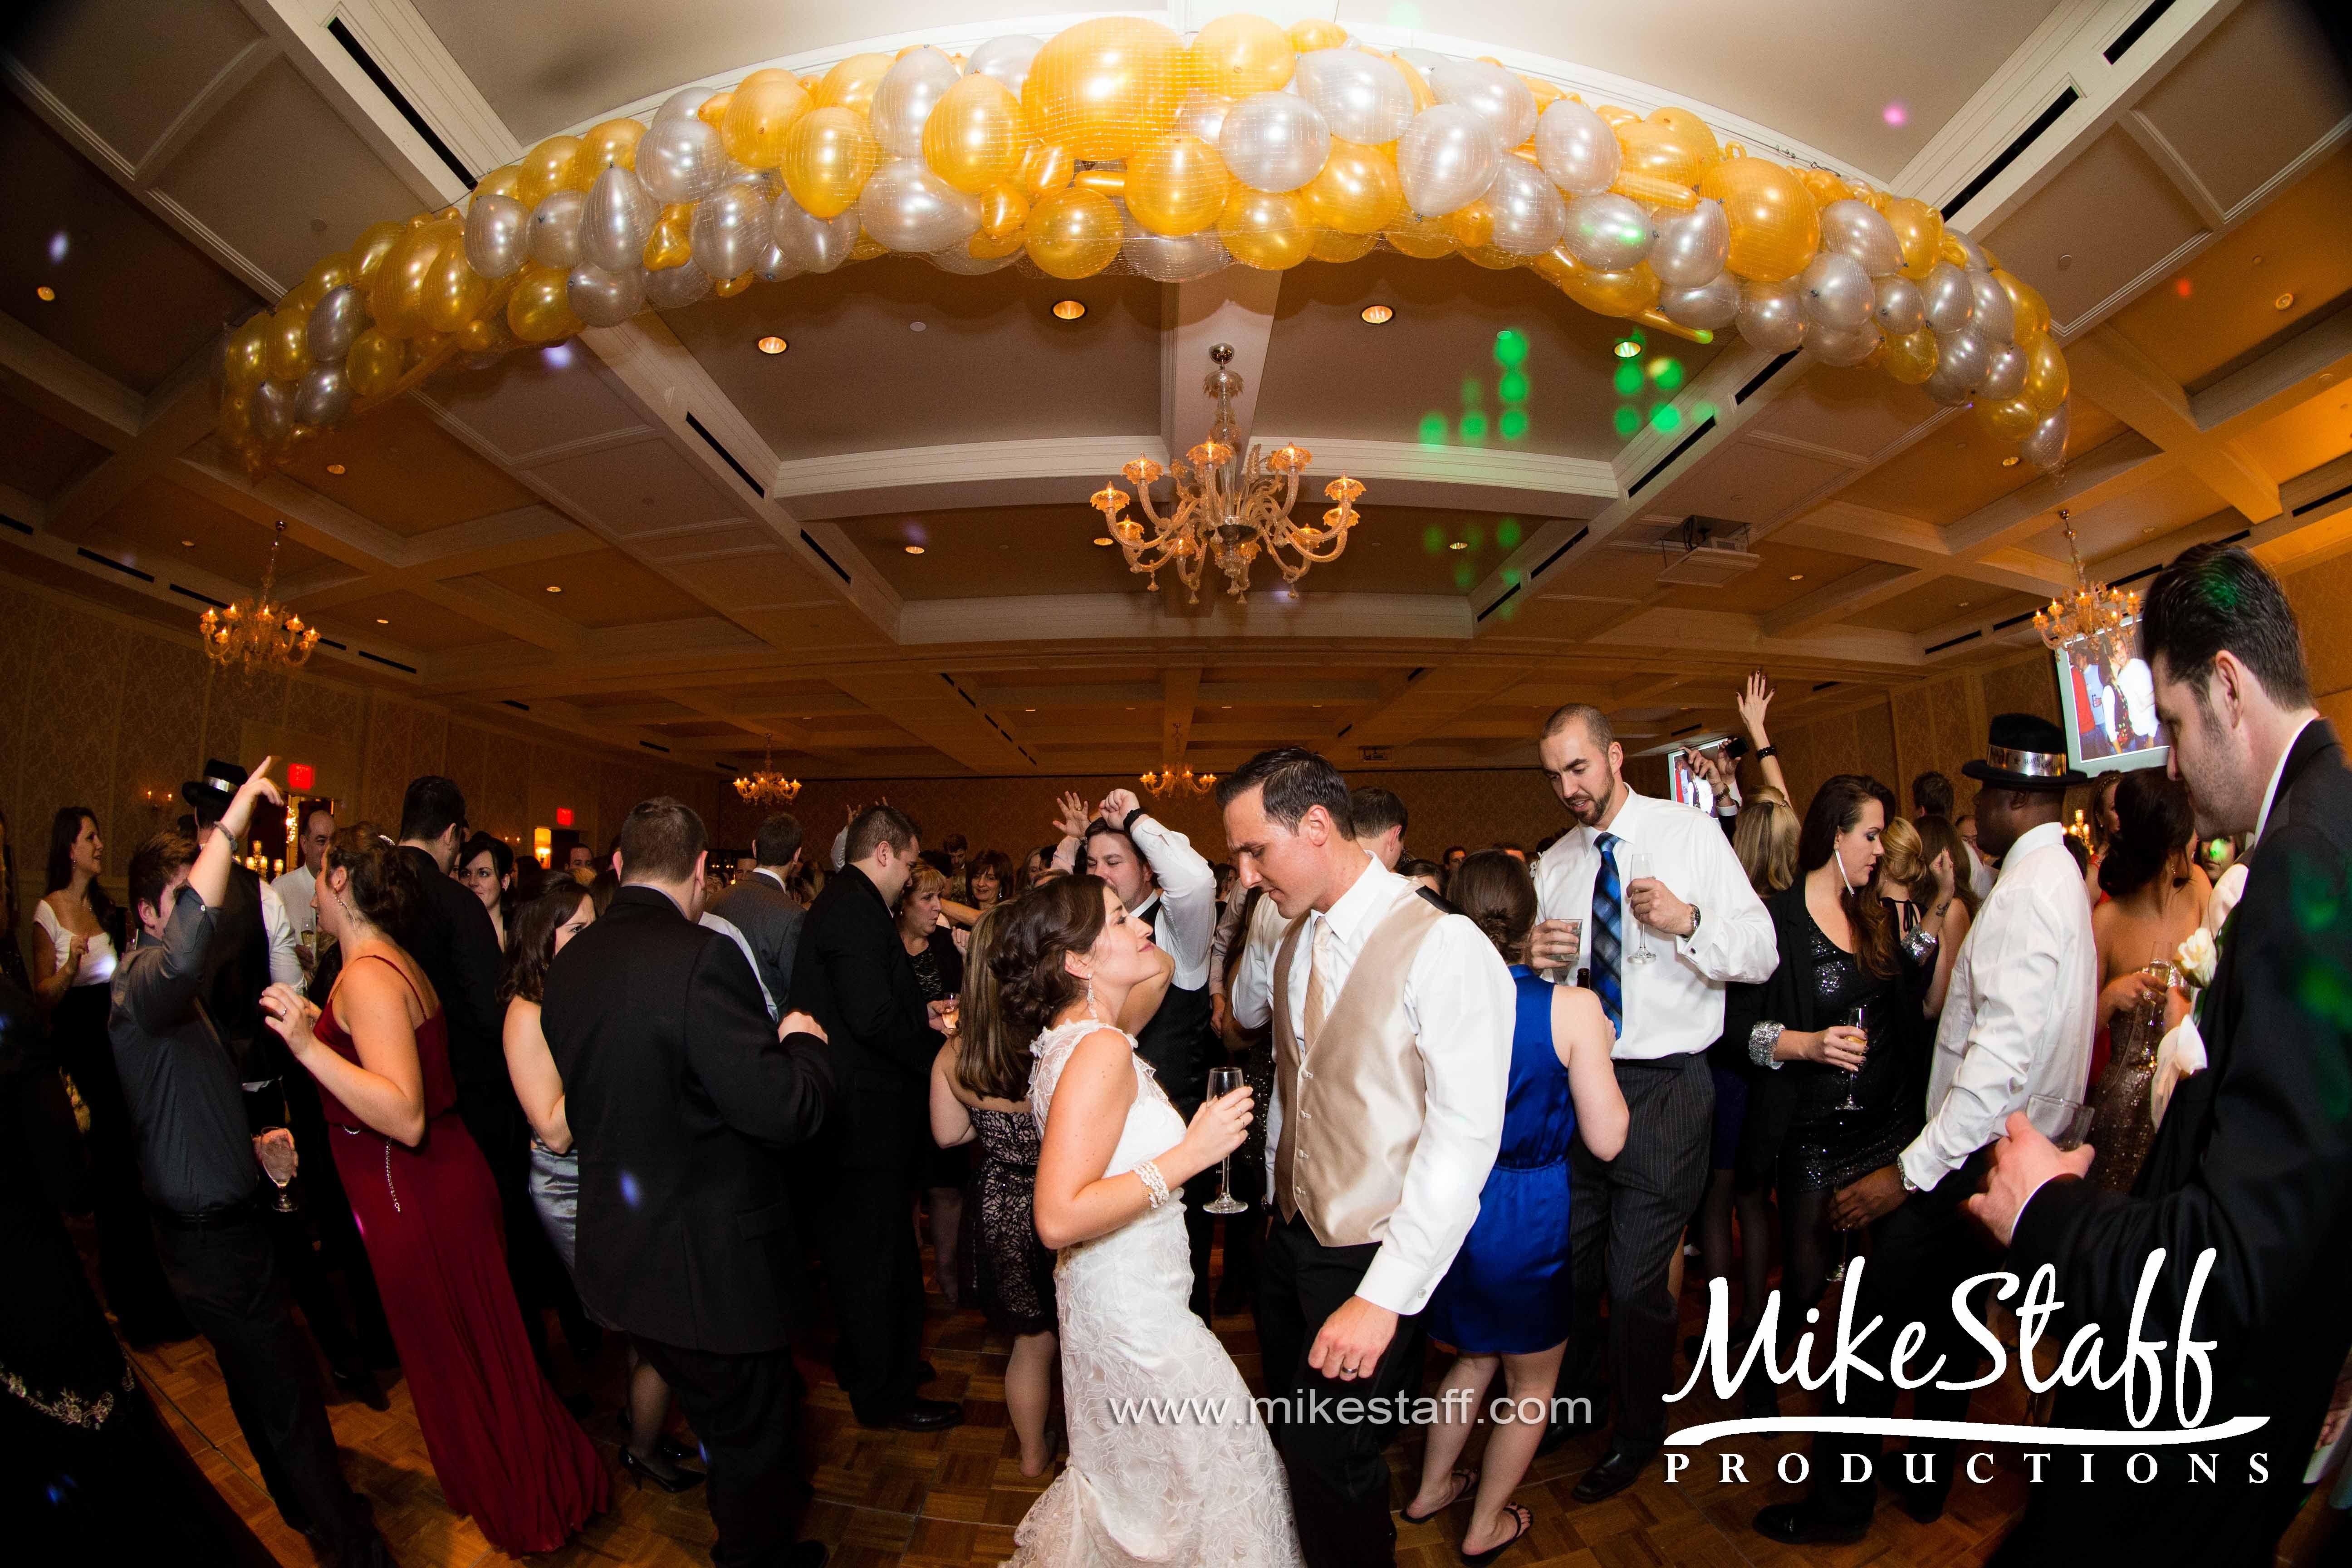 Wedding Dj Services Michigan Wedding Reception Wedding Dj Wedding Reception Dance Floor